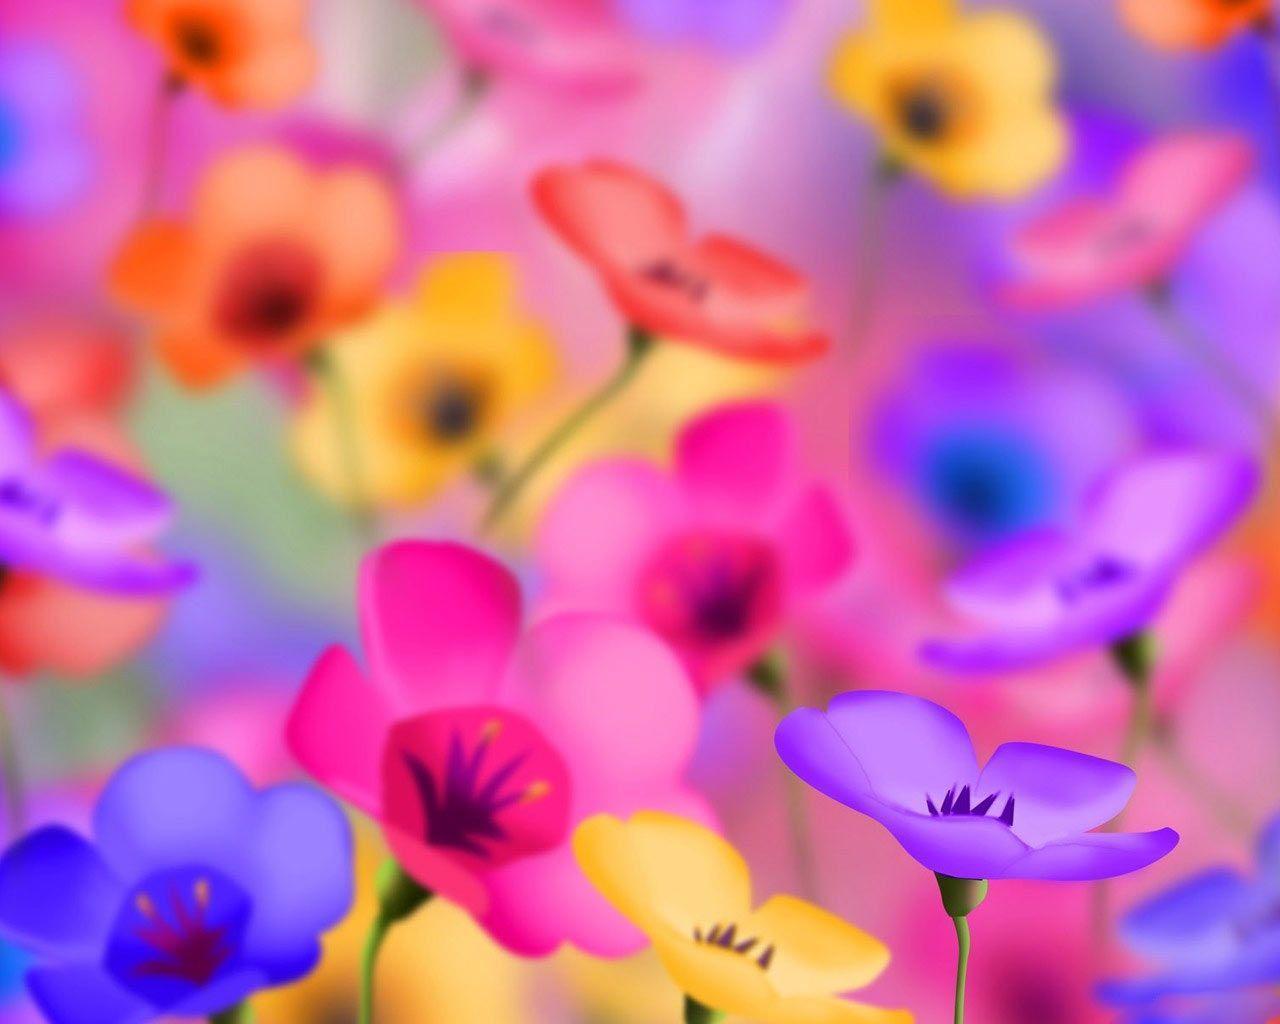 Download windows seven black 1024x768 wallpaper 1771 - Desktop Wallpaper Gallery Windows 7 Colorful Flowers Desktop